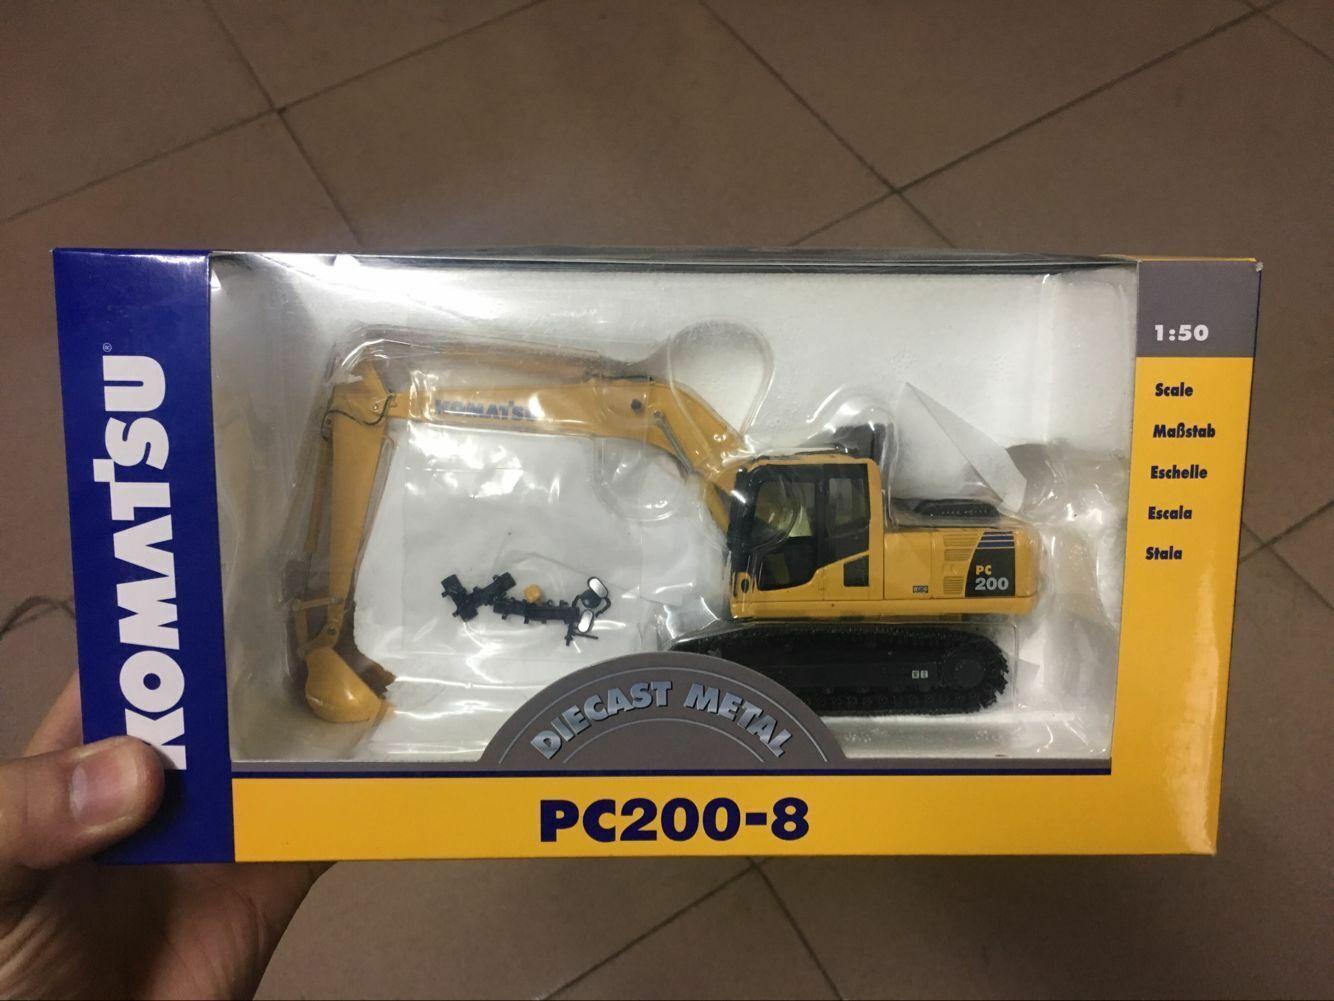 Rare   NZG NZG NZG 804 Komatsu PC200-8 Excavator 1 50 Scale DieCast Metal Model 9d0c62